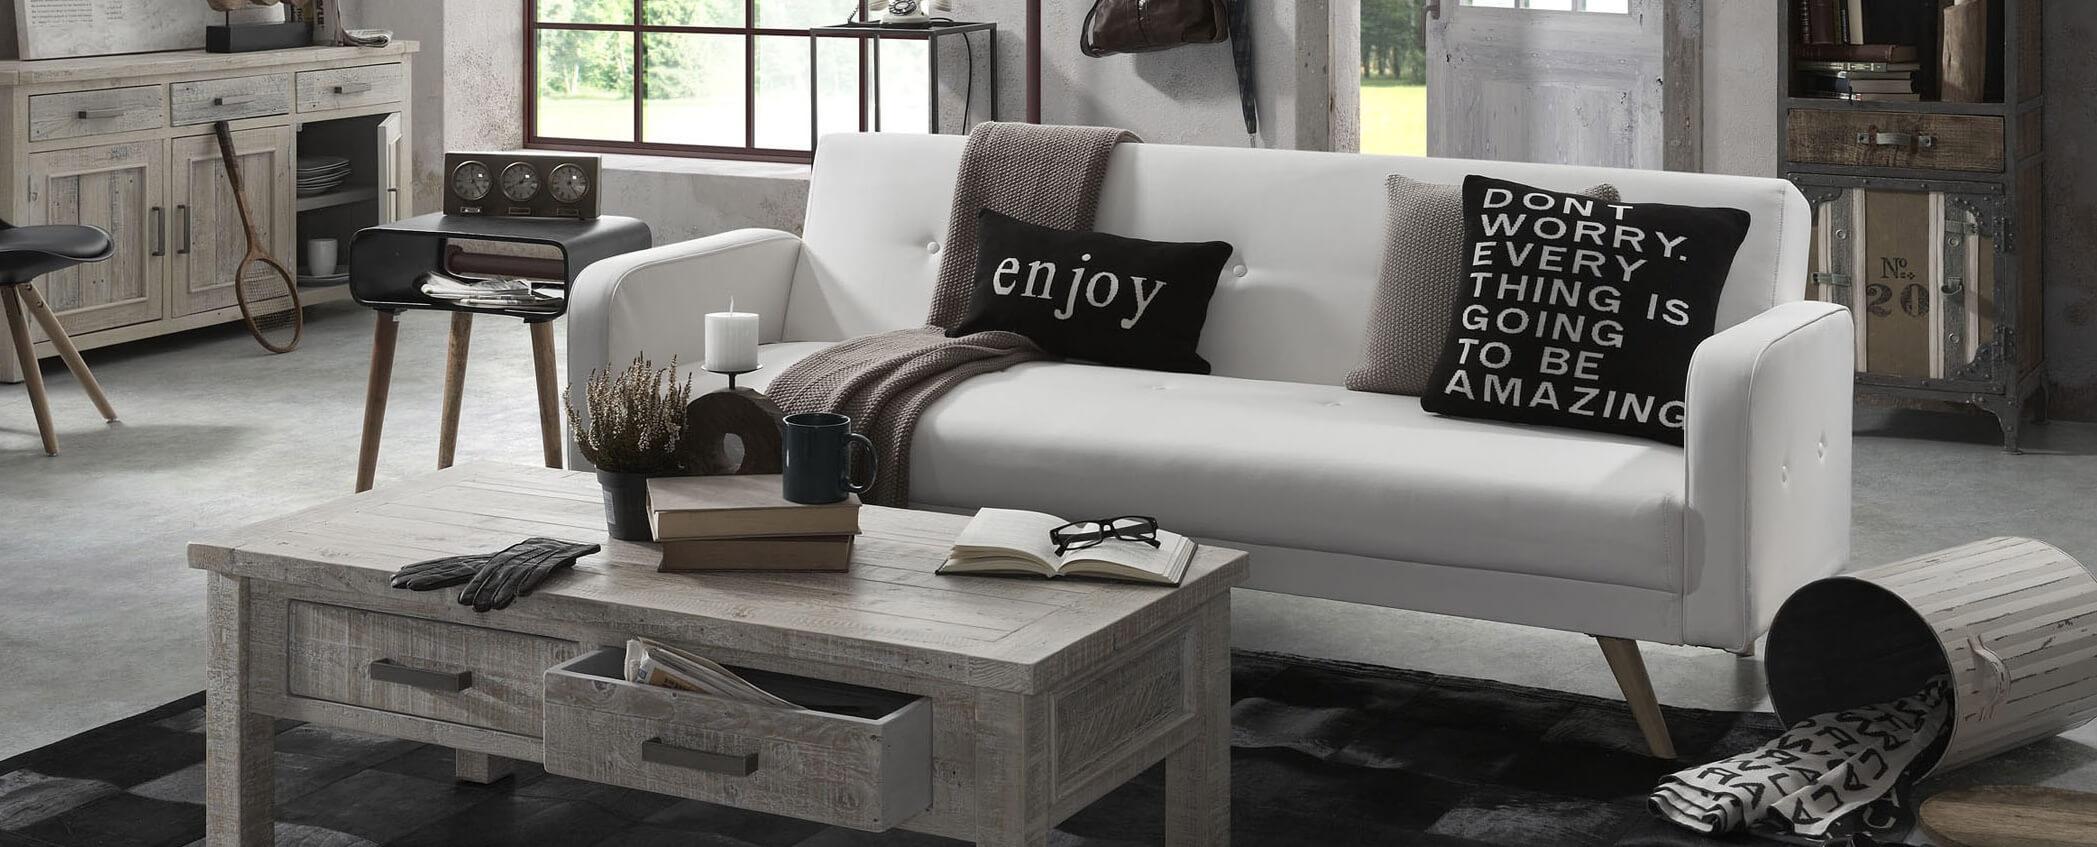 Sof s cama minimalista moderno ambients - Sofa cama minimalista ...